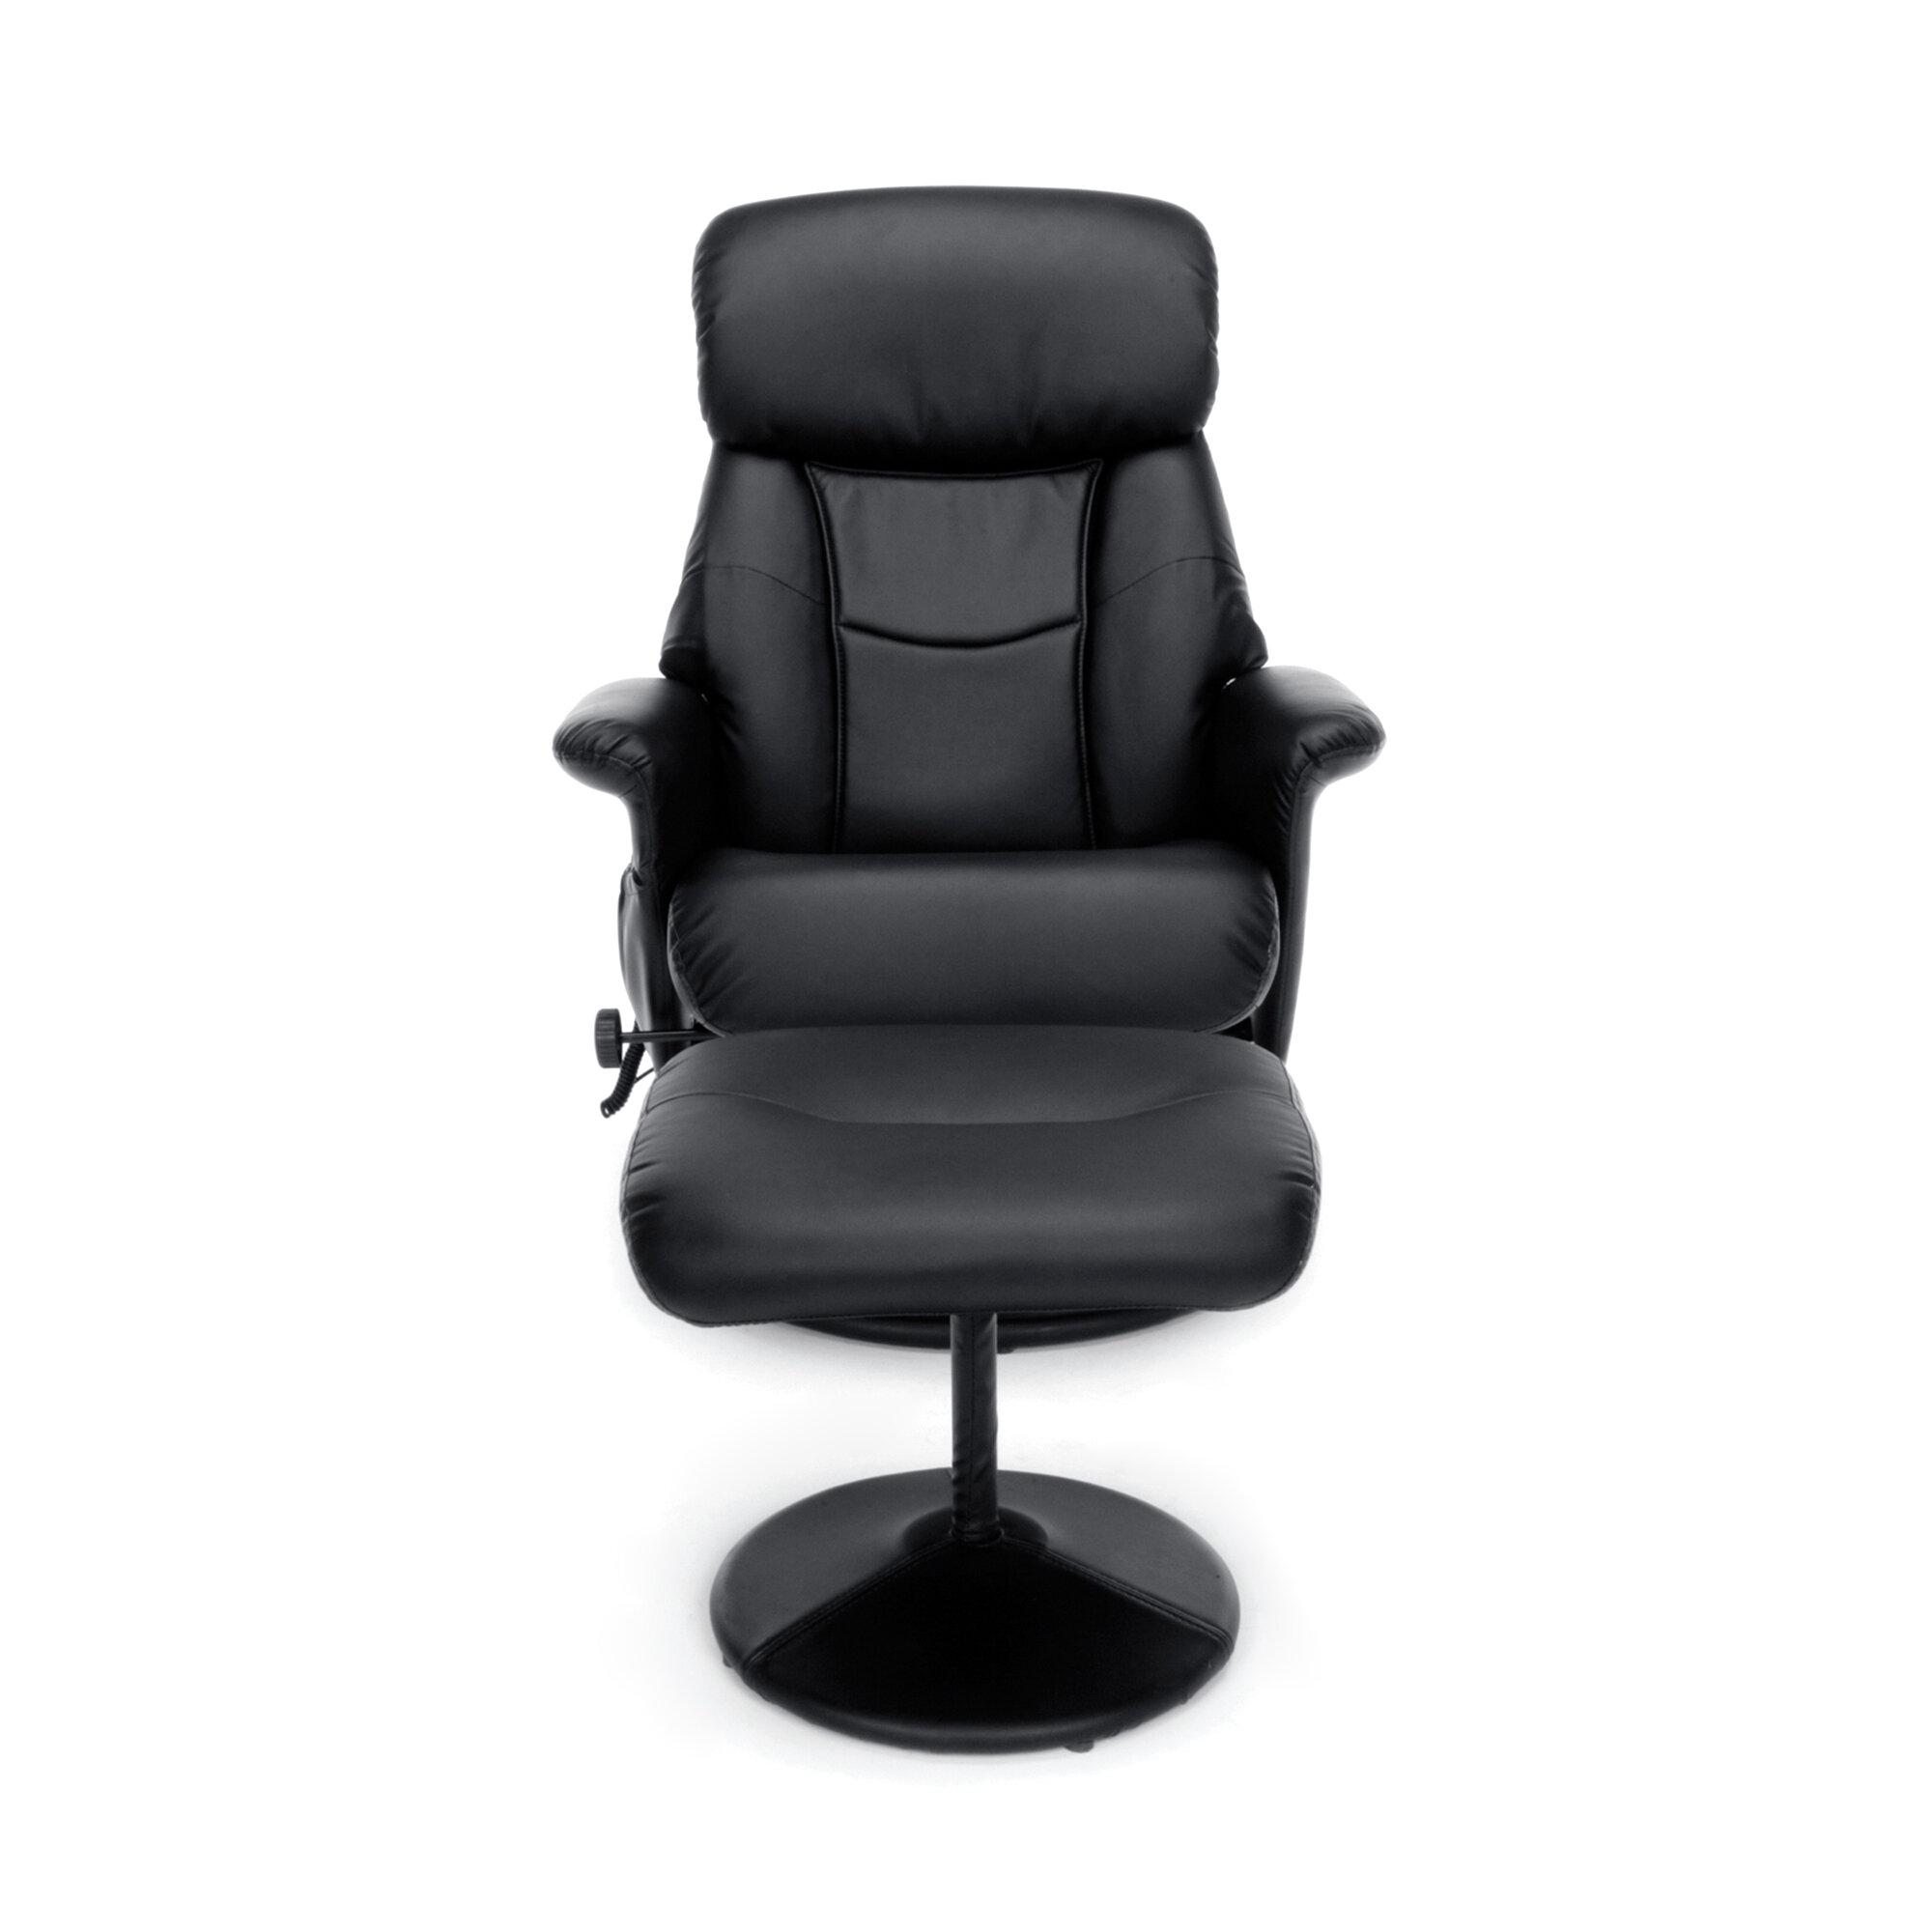 ofm essentials heated massage executive chair with ottoman wayfair